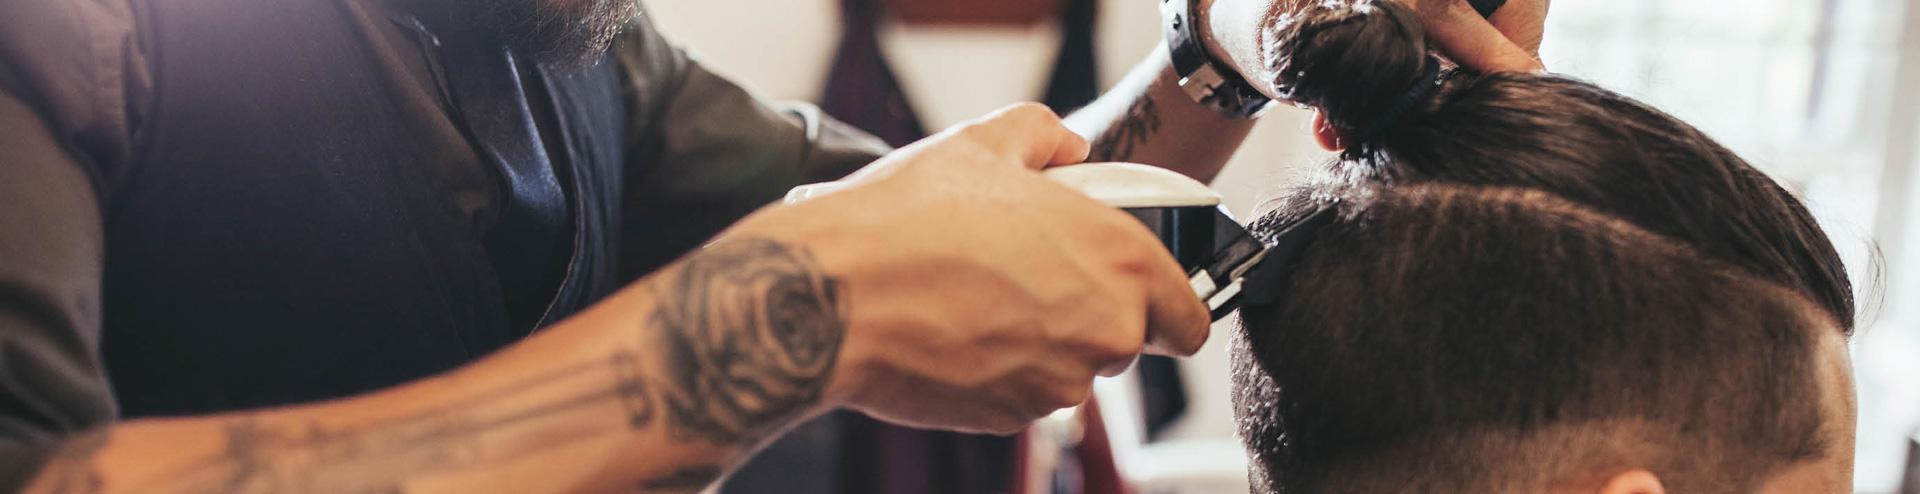 Barber στη Χαλκίδα   Περιποίηση Γενειάδας   Ανδρική Περιποίηση Άκρων   Αποτρίχωση